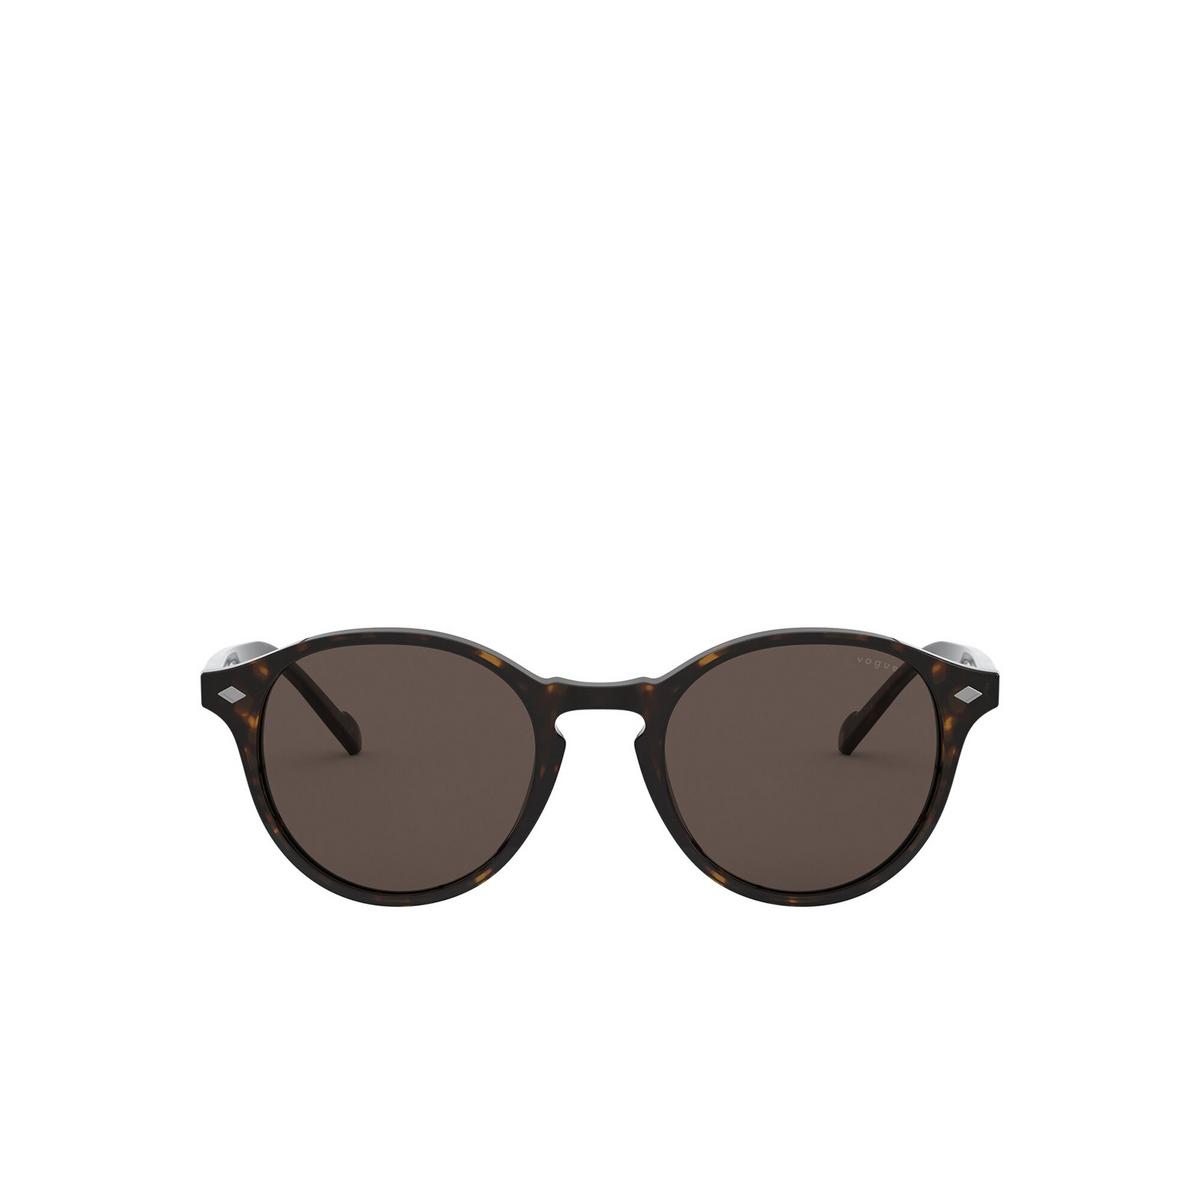 Vogue® Round Sunglasses: VO5327S color Dark Havana W65673 - front view.